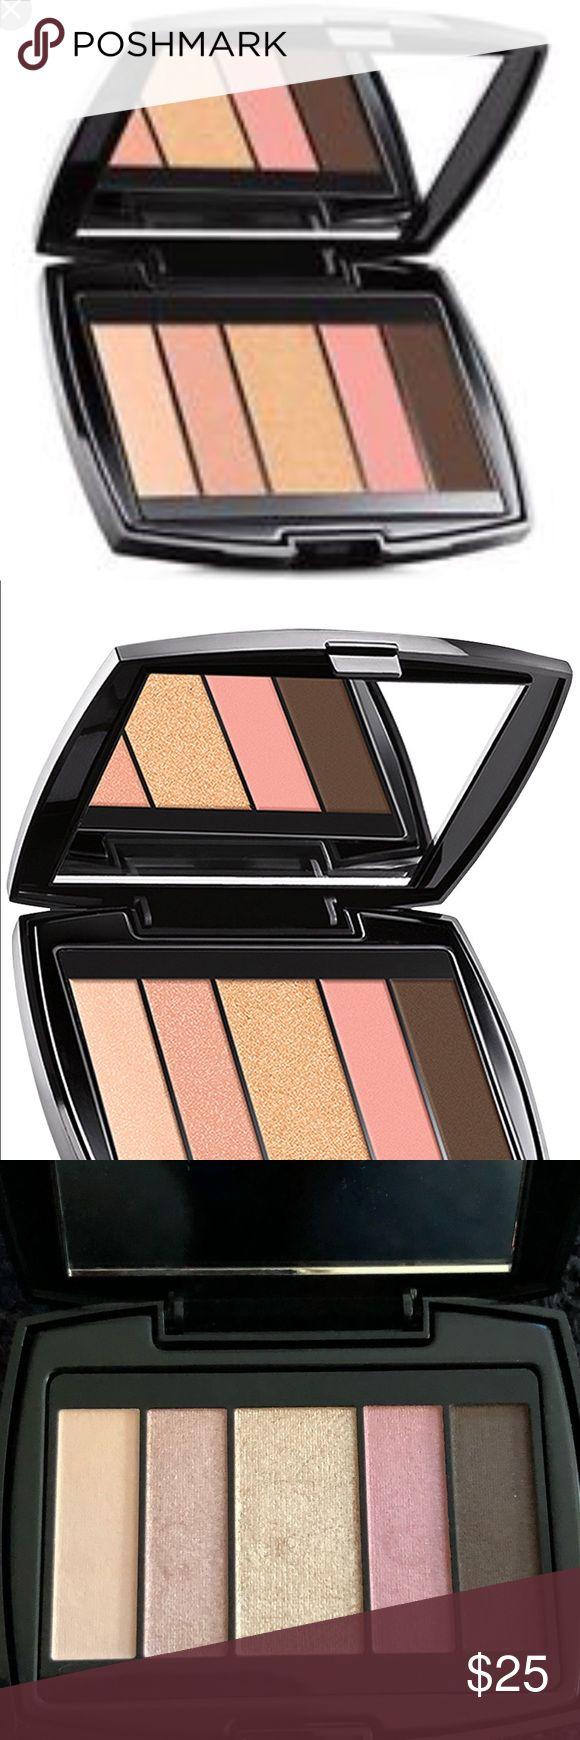 Lancôme Color Design Eye Shadow Palette 🎨 🎊BRAND NEW